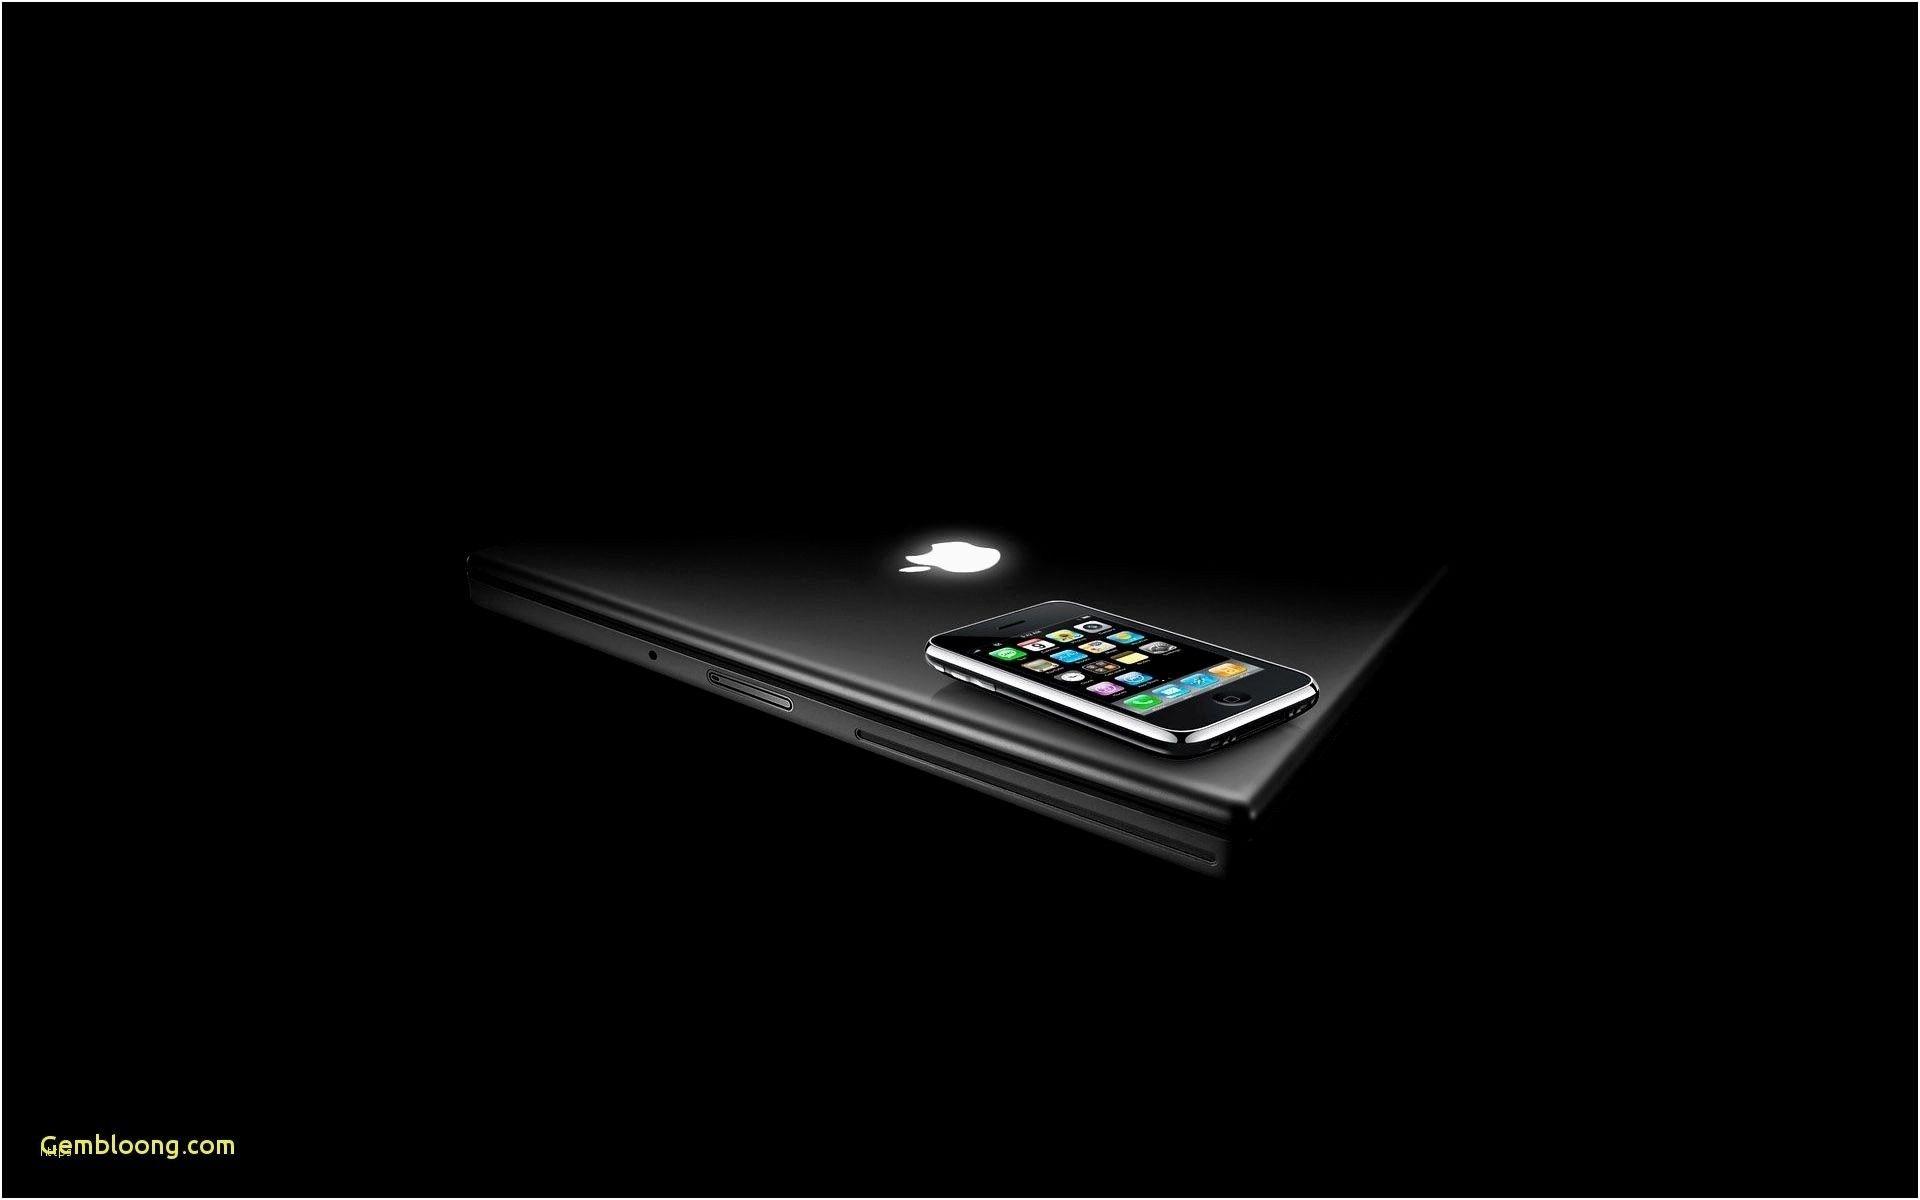 Unique Pretty Backgrounds For Phones Di 2020 Dengan Gambar